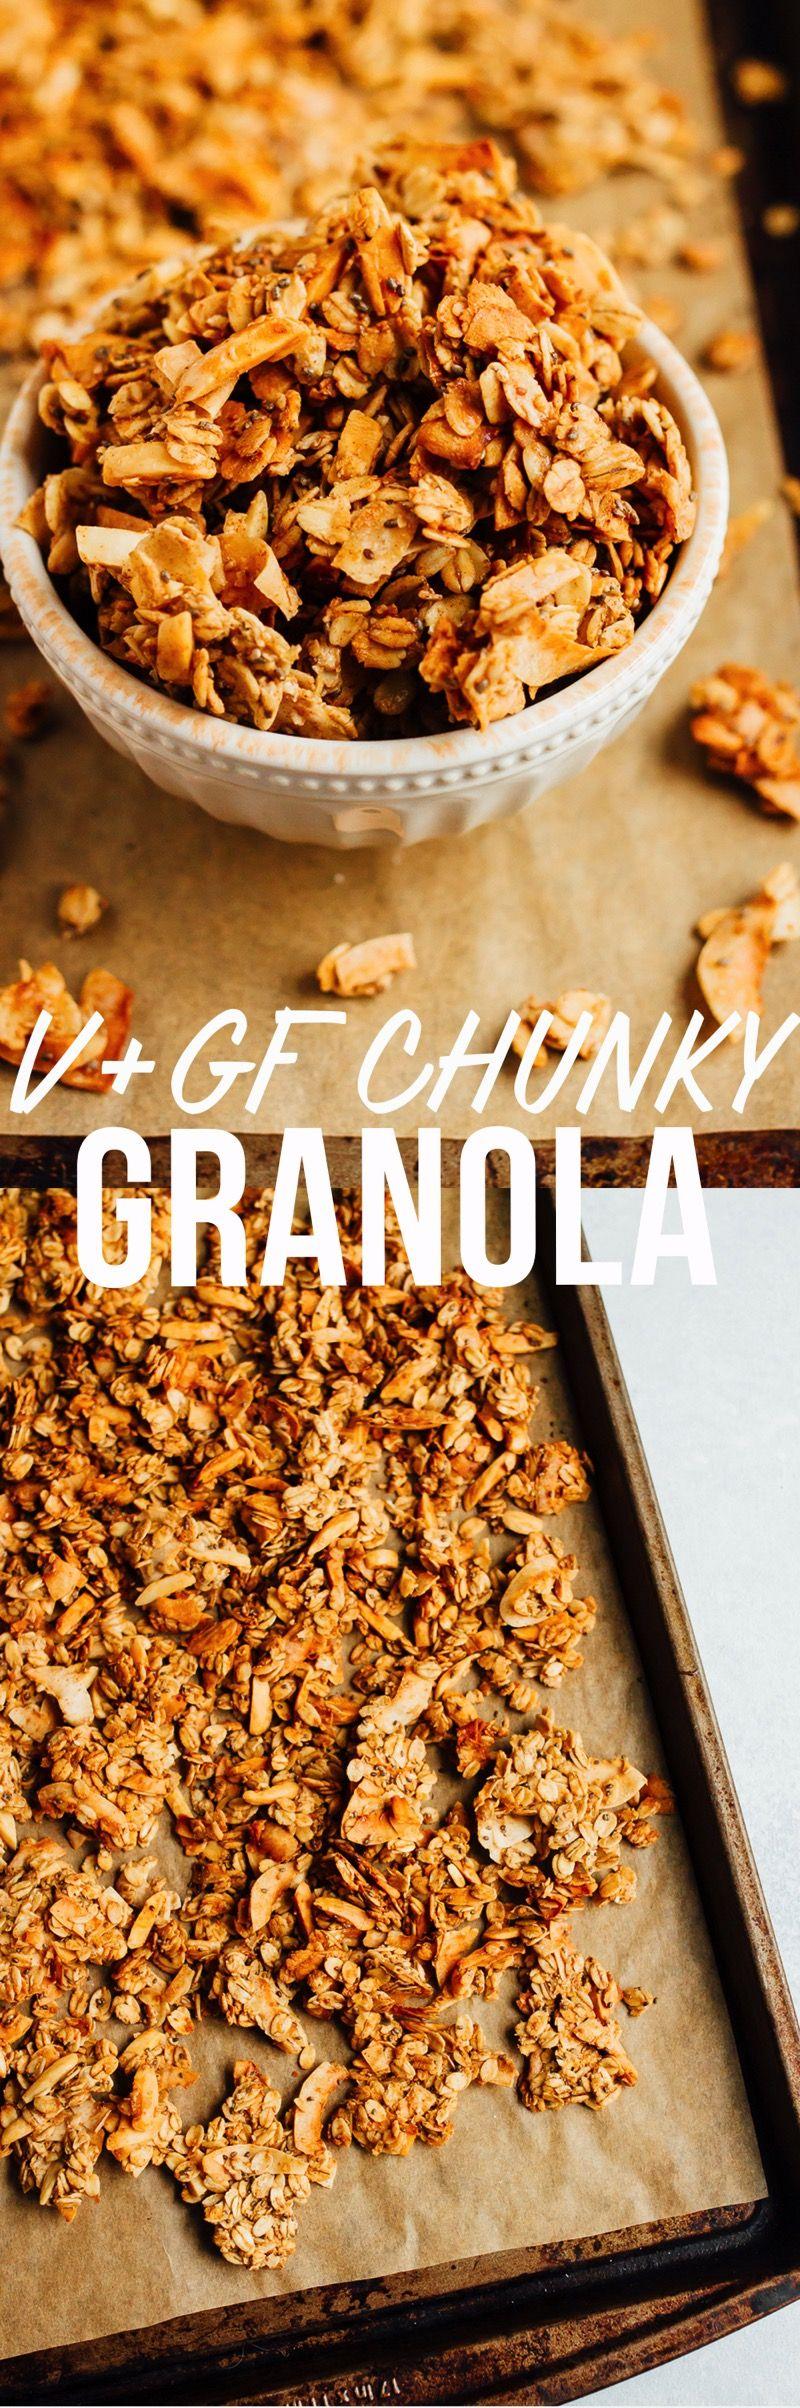 Coconut almond granola recipe food food recipes granola